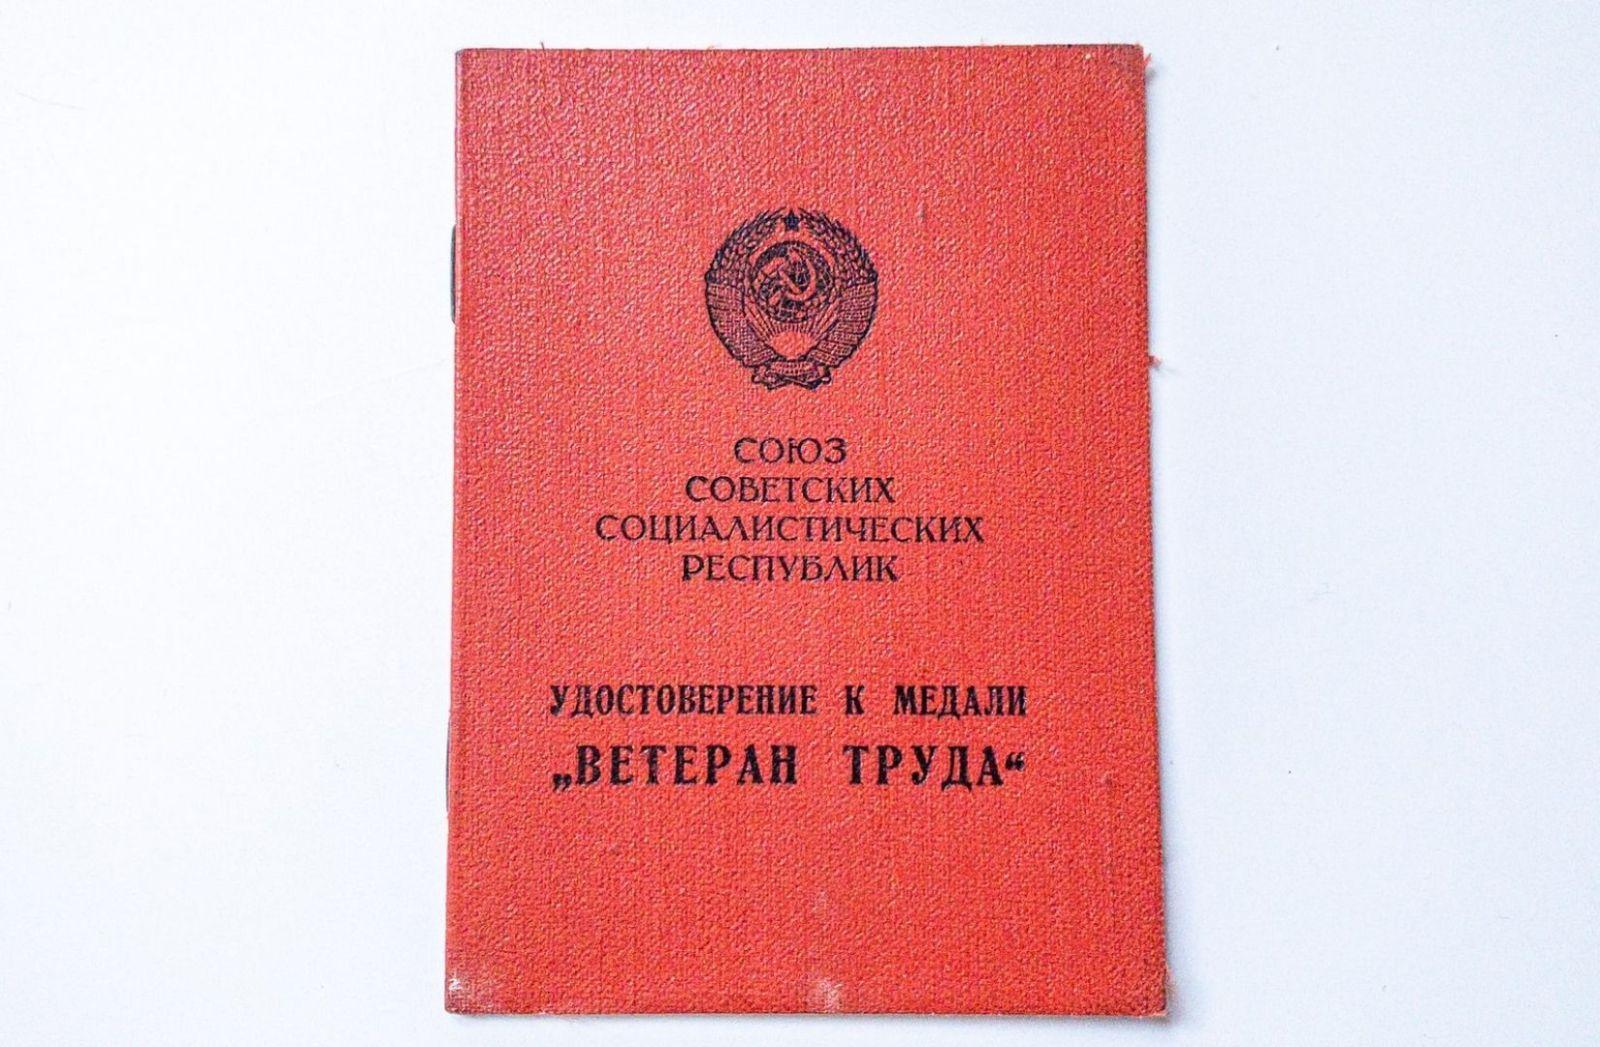 Pass der UdSSR. (Foto: Anton Maksimov Juvnsky, Unsplash.com)